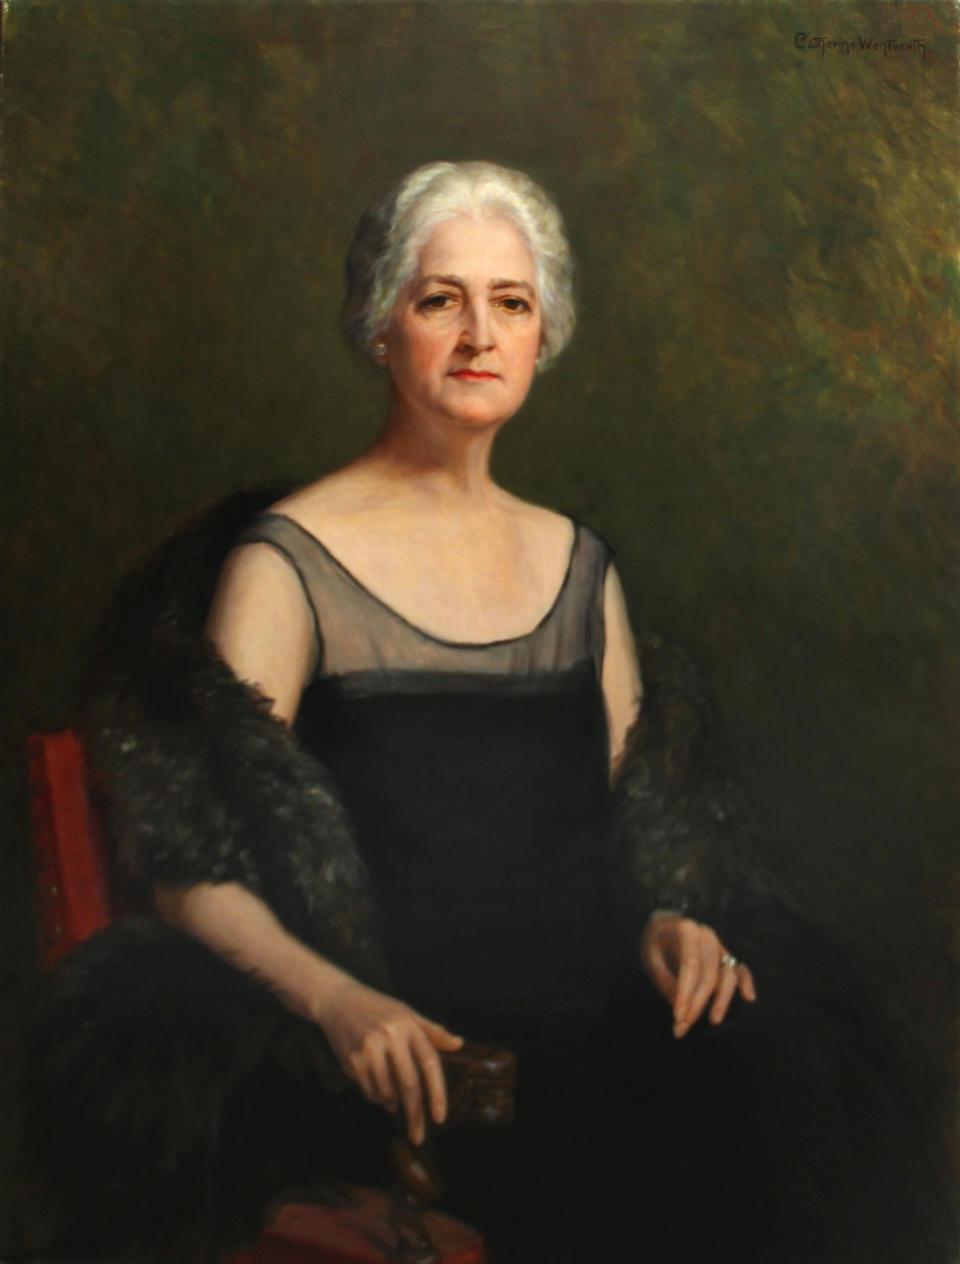 Catherine Denkman Wentworth (American, 1865-1948) Self-portrait, circa 1920; Portrait of Mr. Wentworth, circa 1920 (a pair) first 45 3/4 x 35in; second 36 3/4 x 28 1/2in each unframed